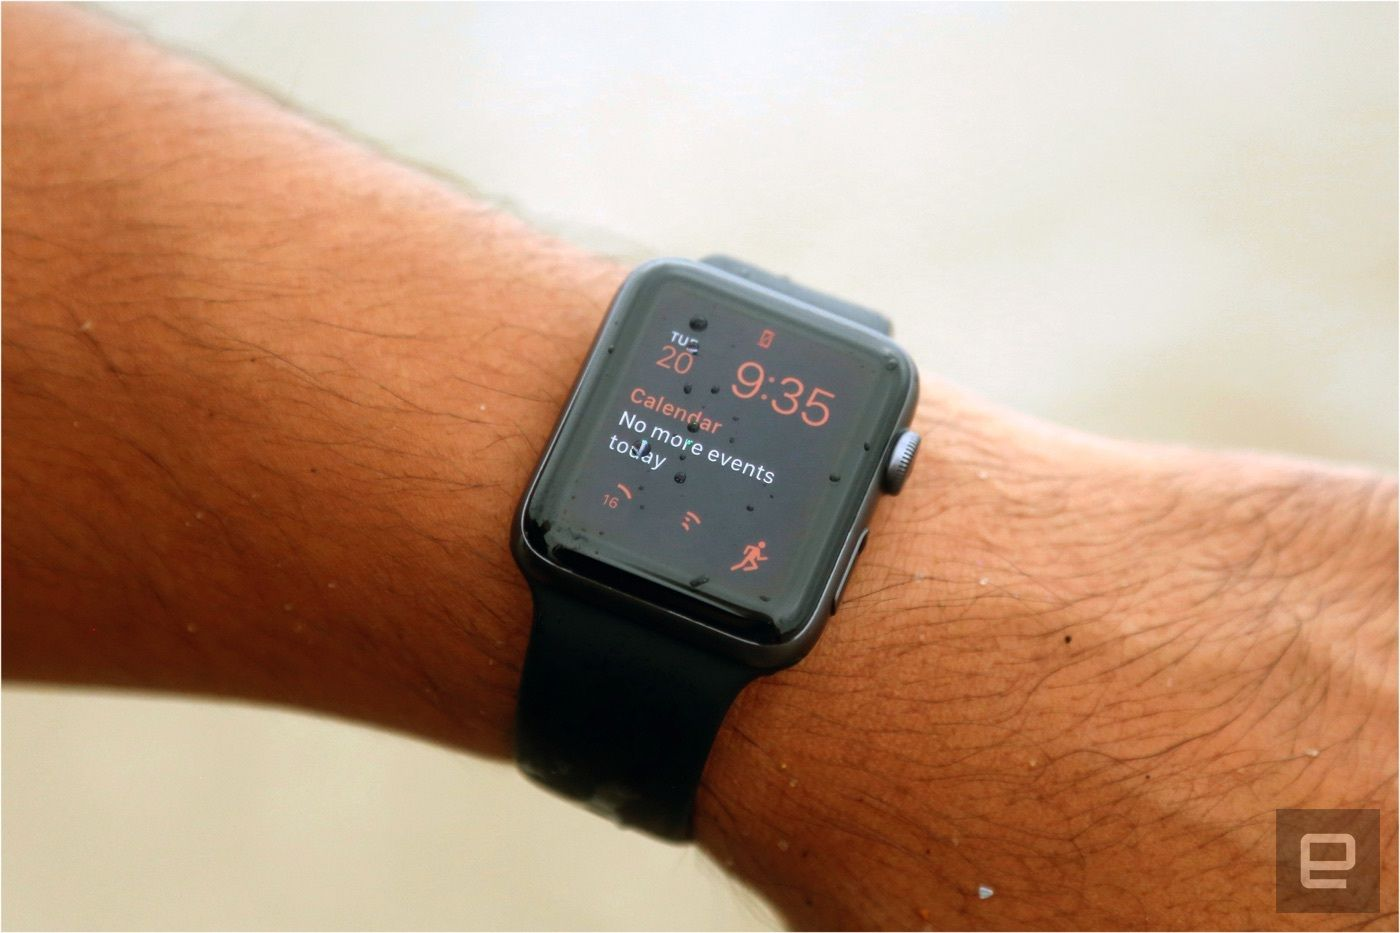 Apple pulls down Watch update that bricked Series 2